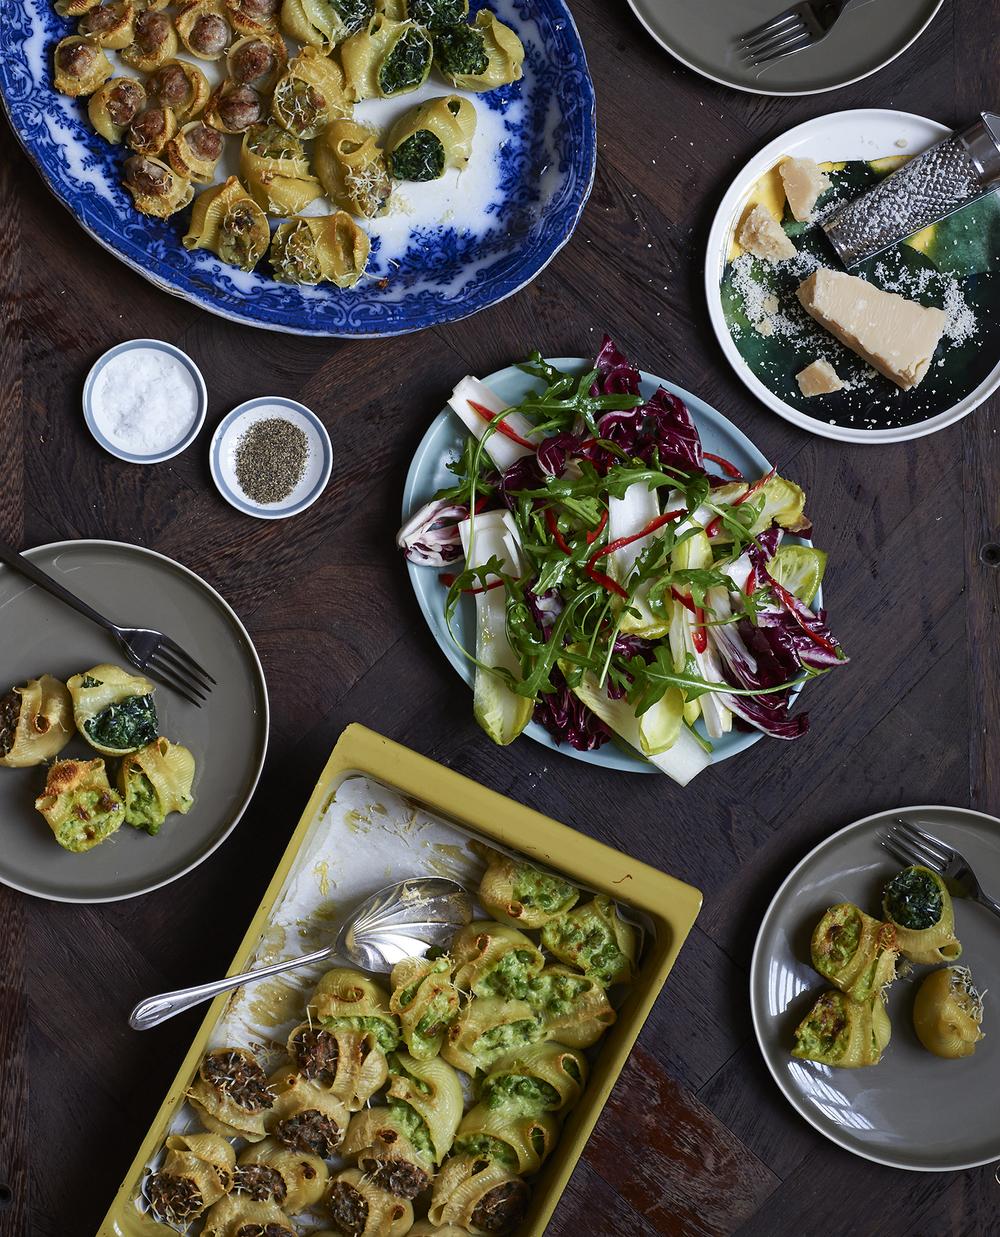 oliver_rowe_guardian_cook_feasting_henry_14.12.15_web.jpg